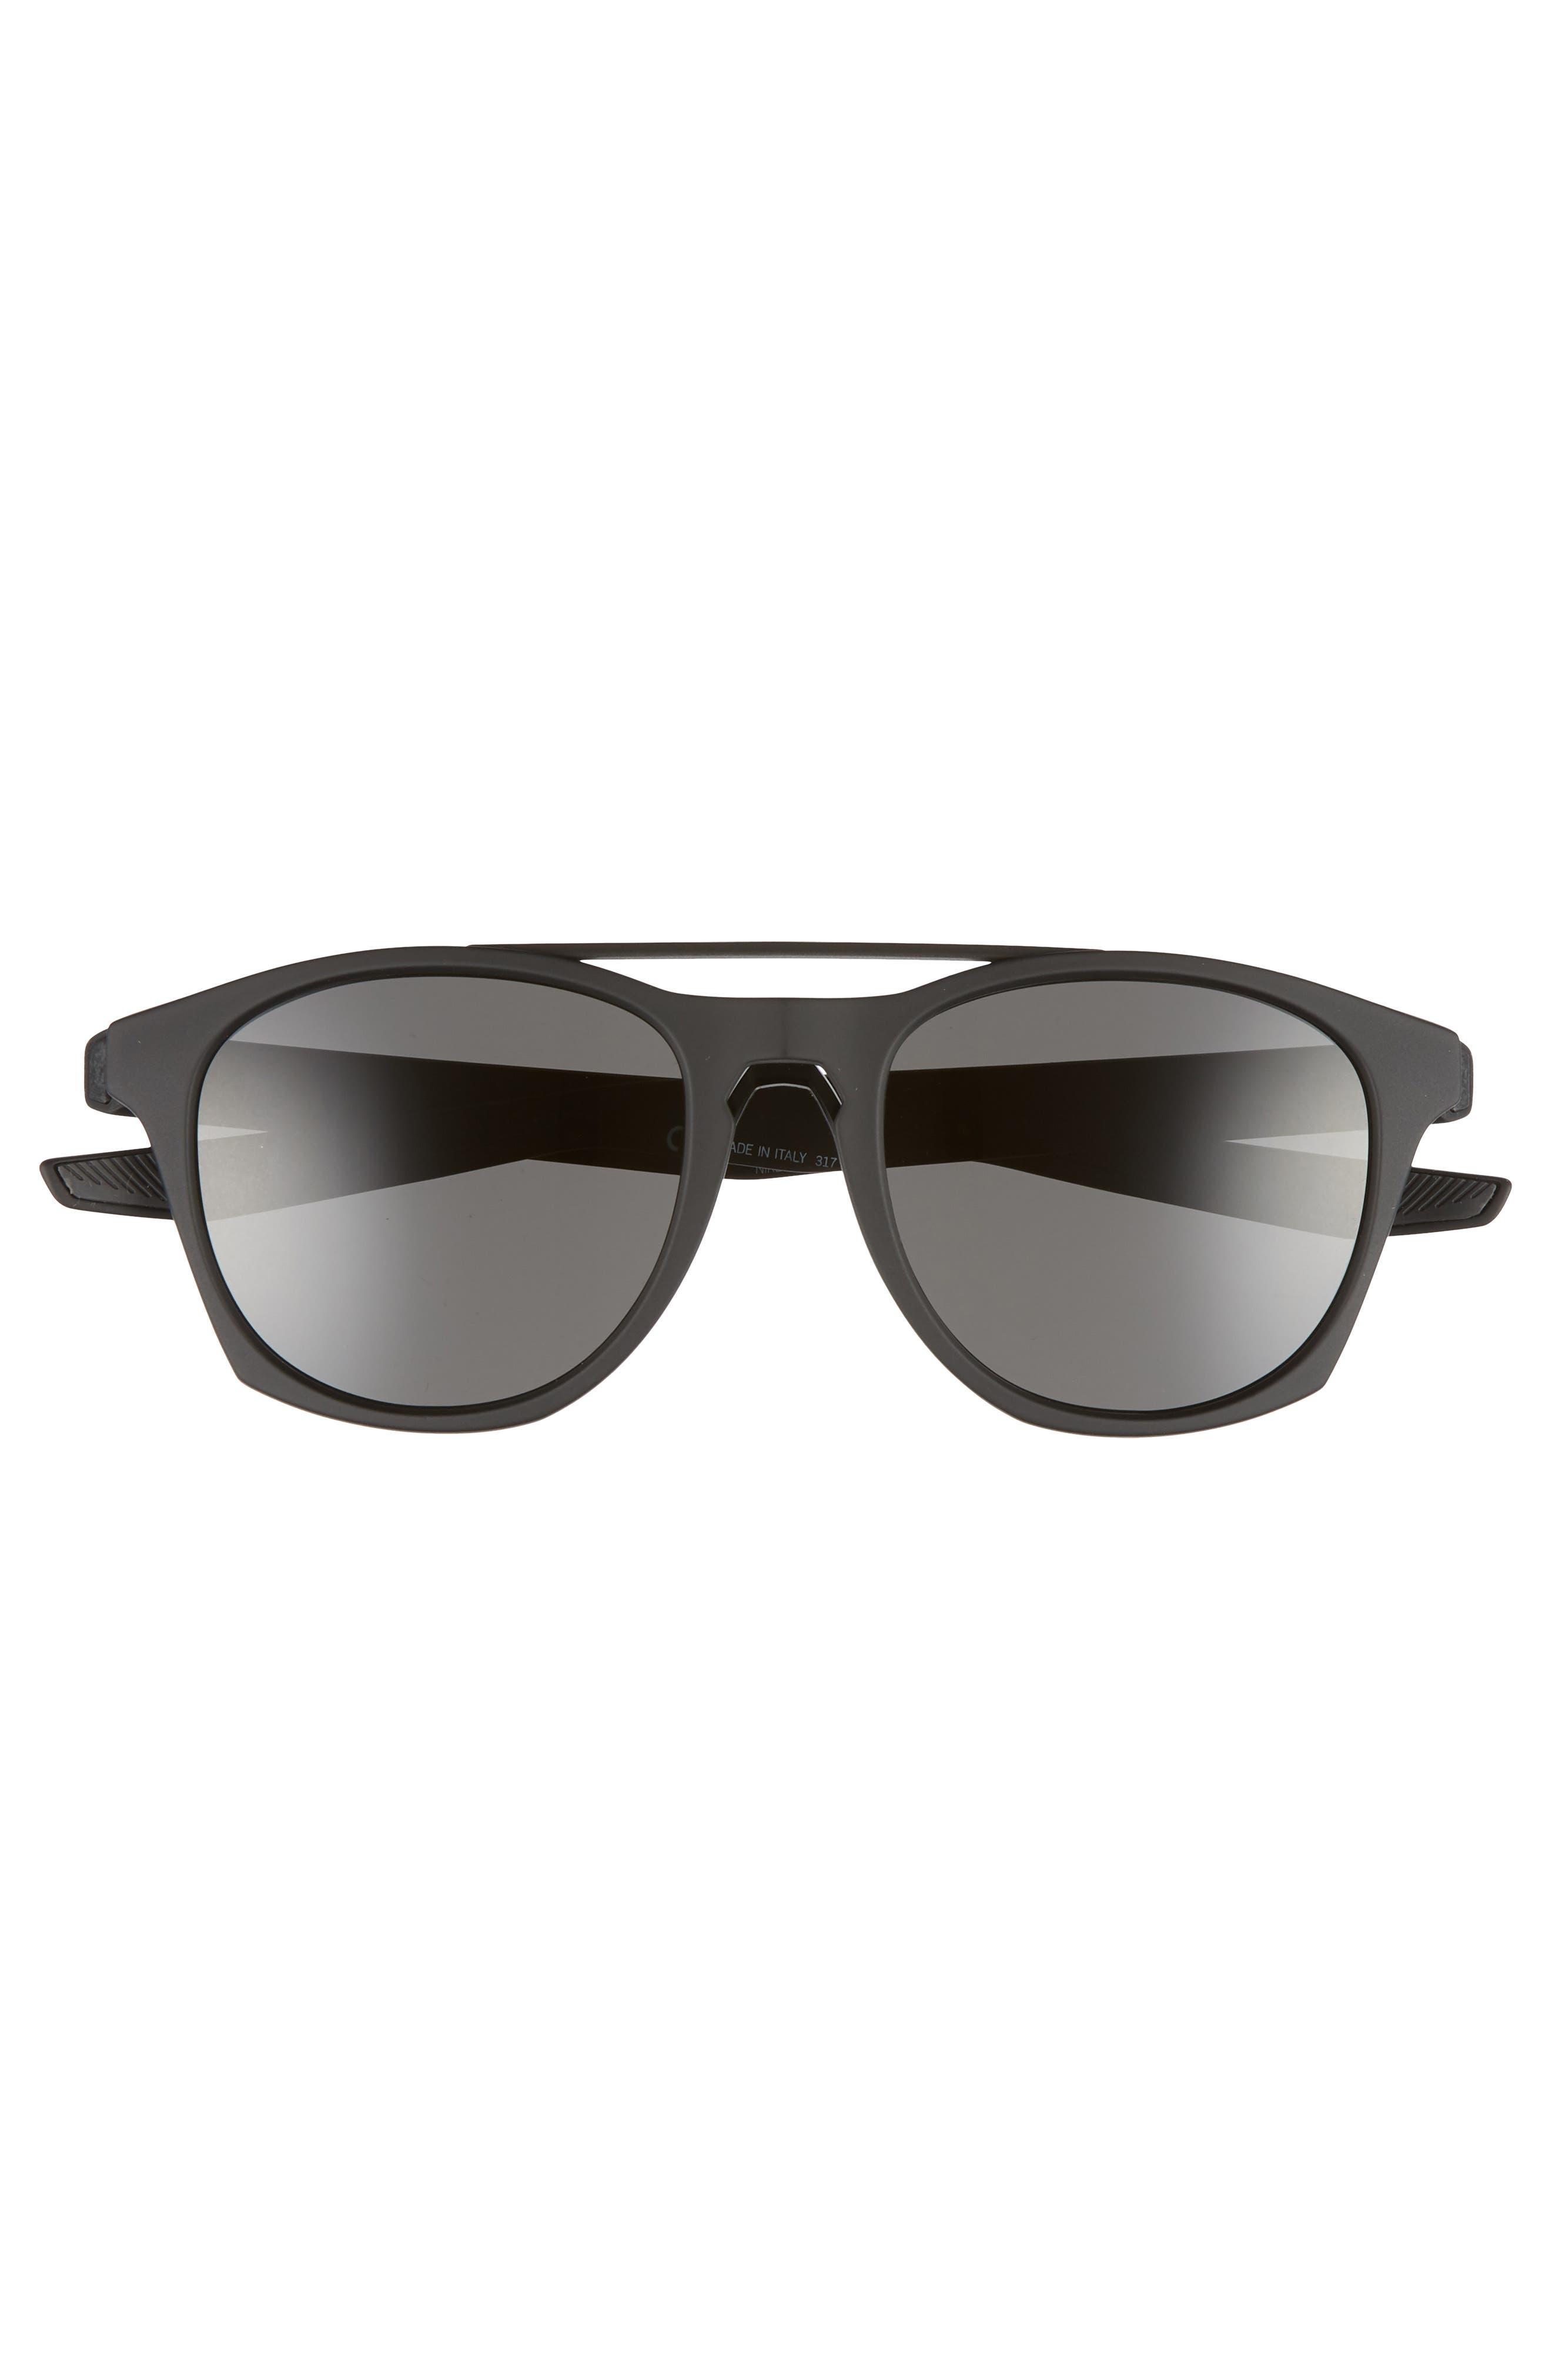 Current 51mm Sunglasses,                             Alternate thumbnail 2, color,                             Matte Black/ Dark Grey